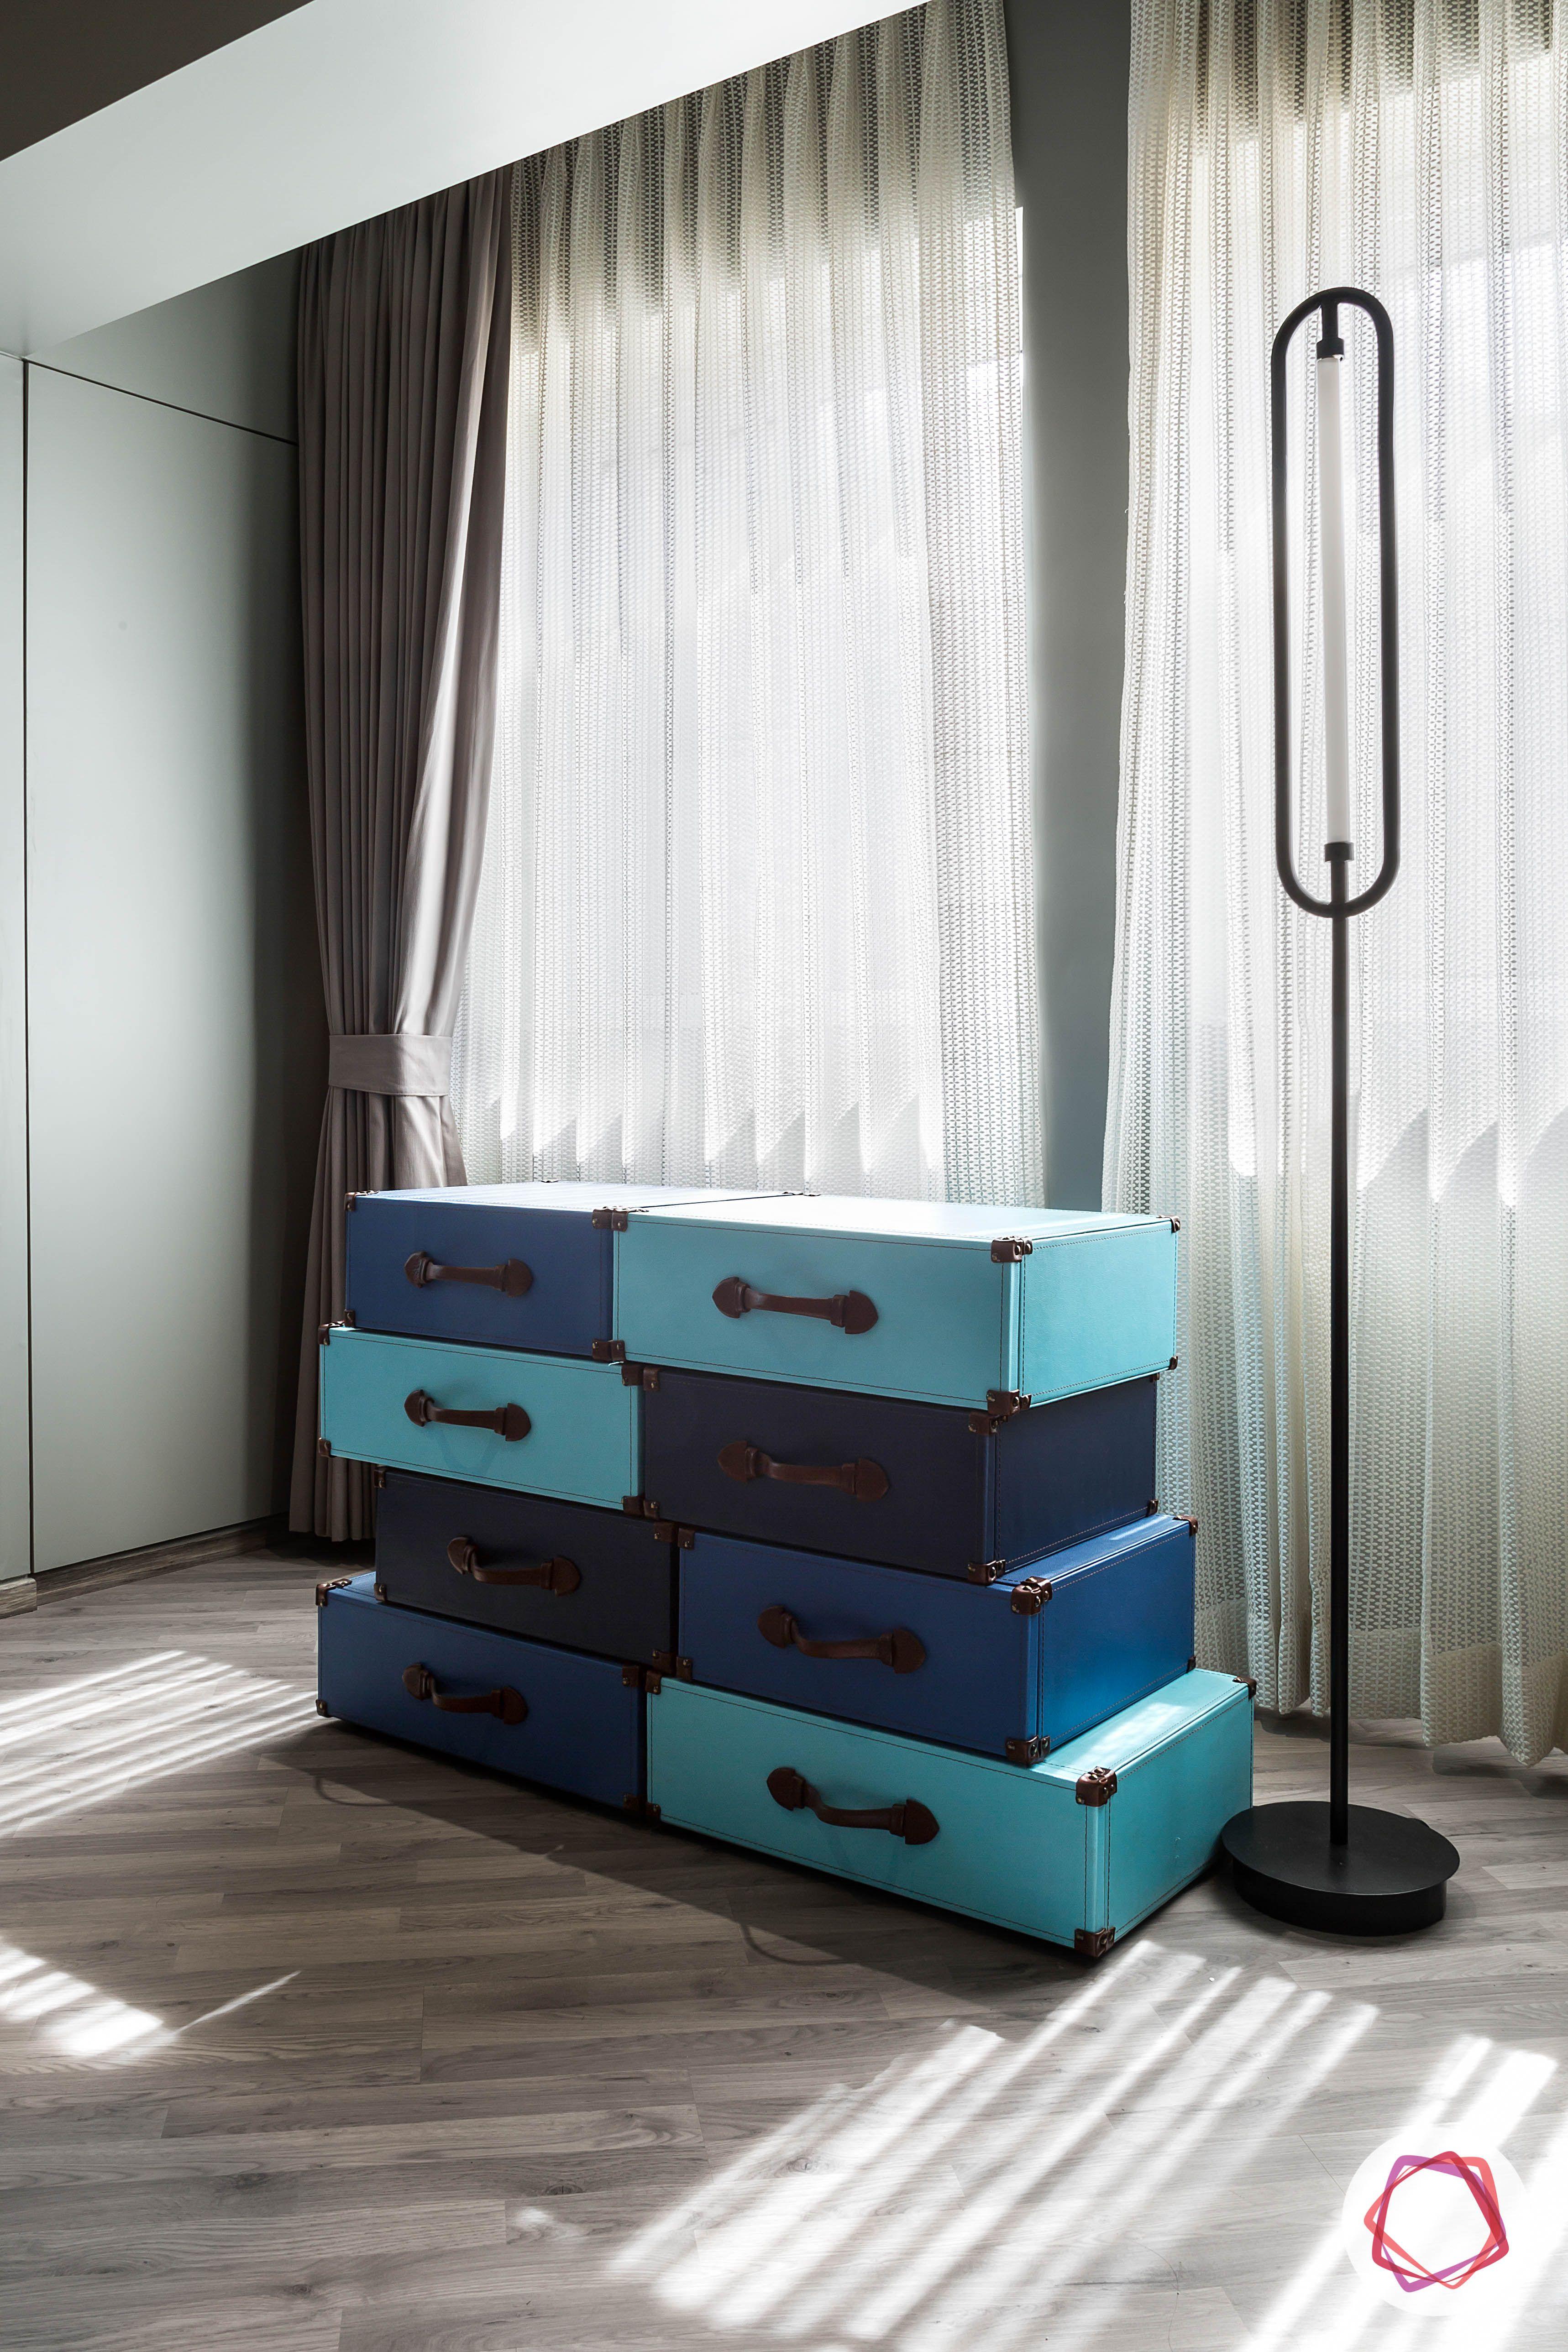 condo-interior-design-bedroom-storage-ideas-chest-of-drawers